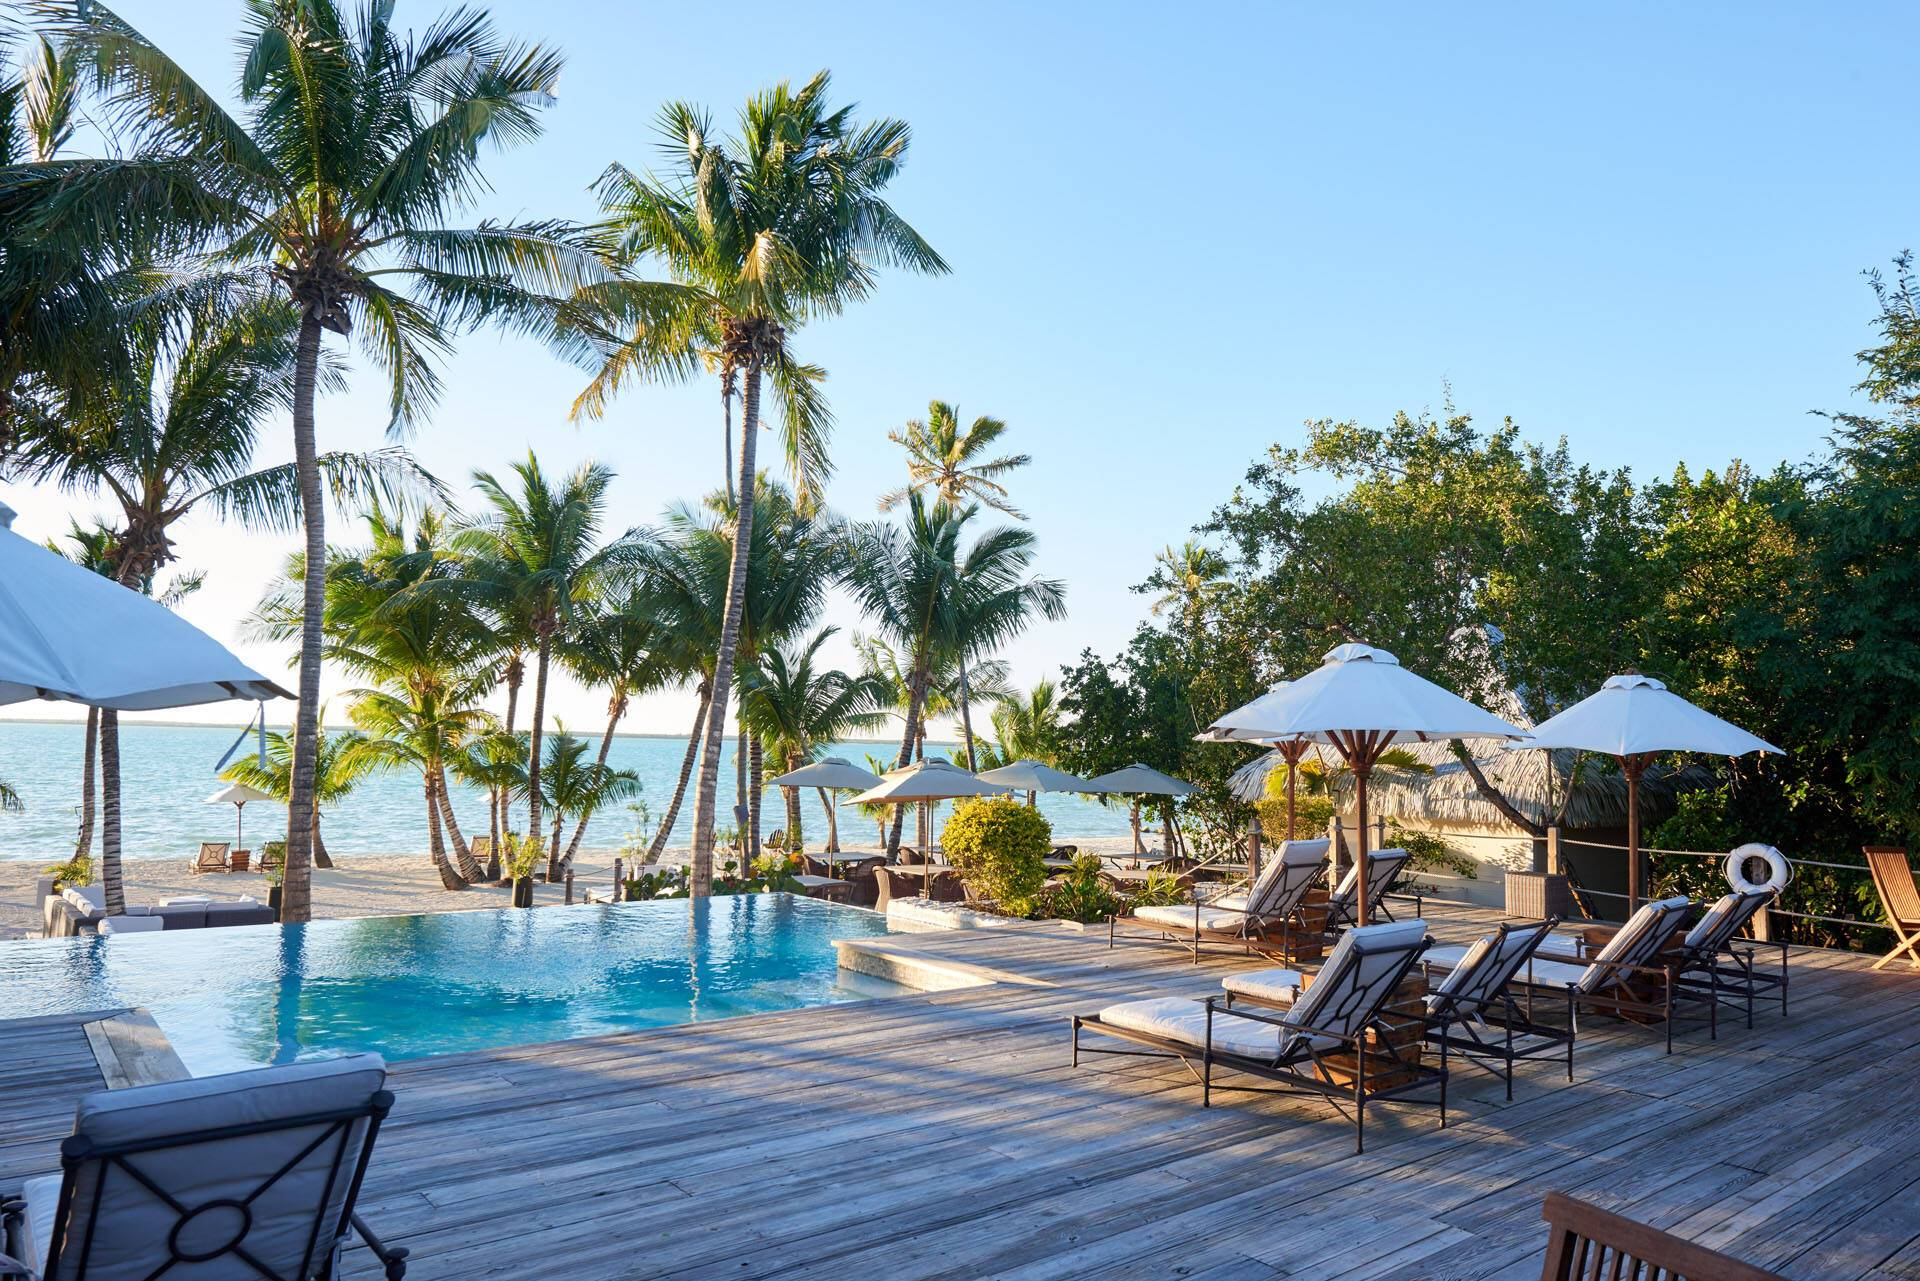 Tiamo Resort Bahamas Andros Piscine